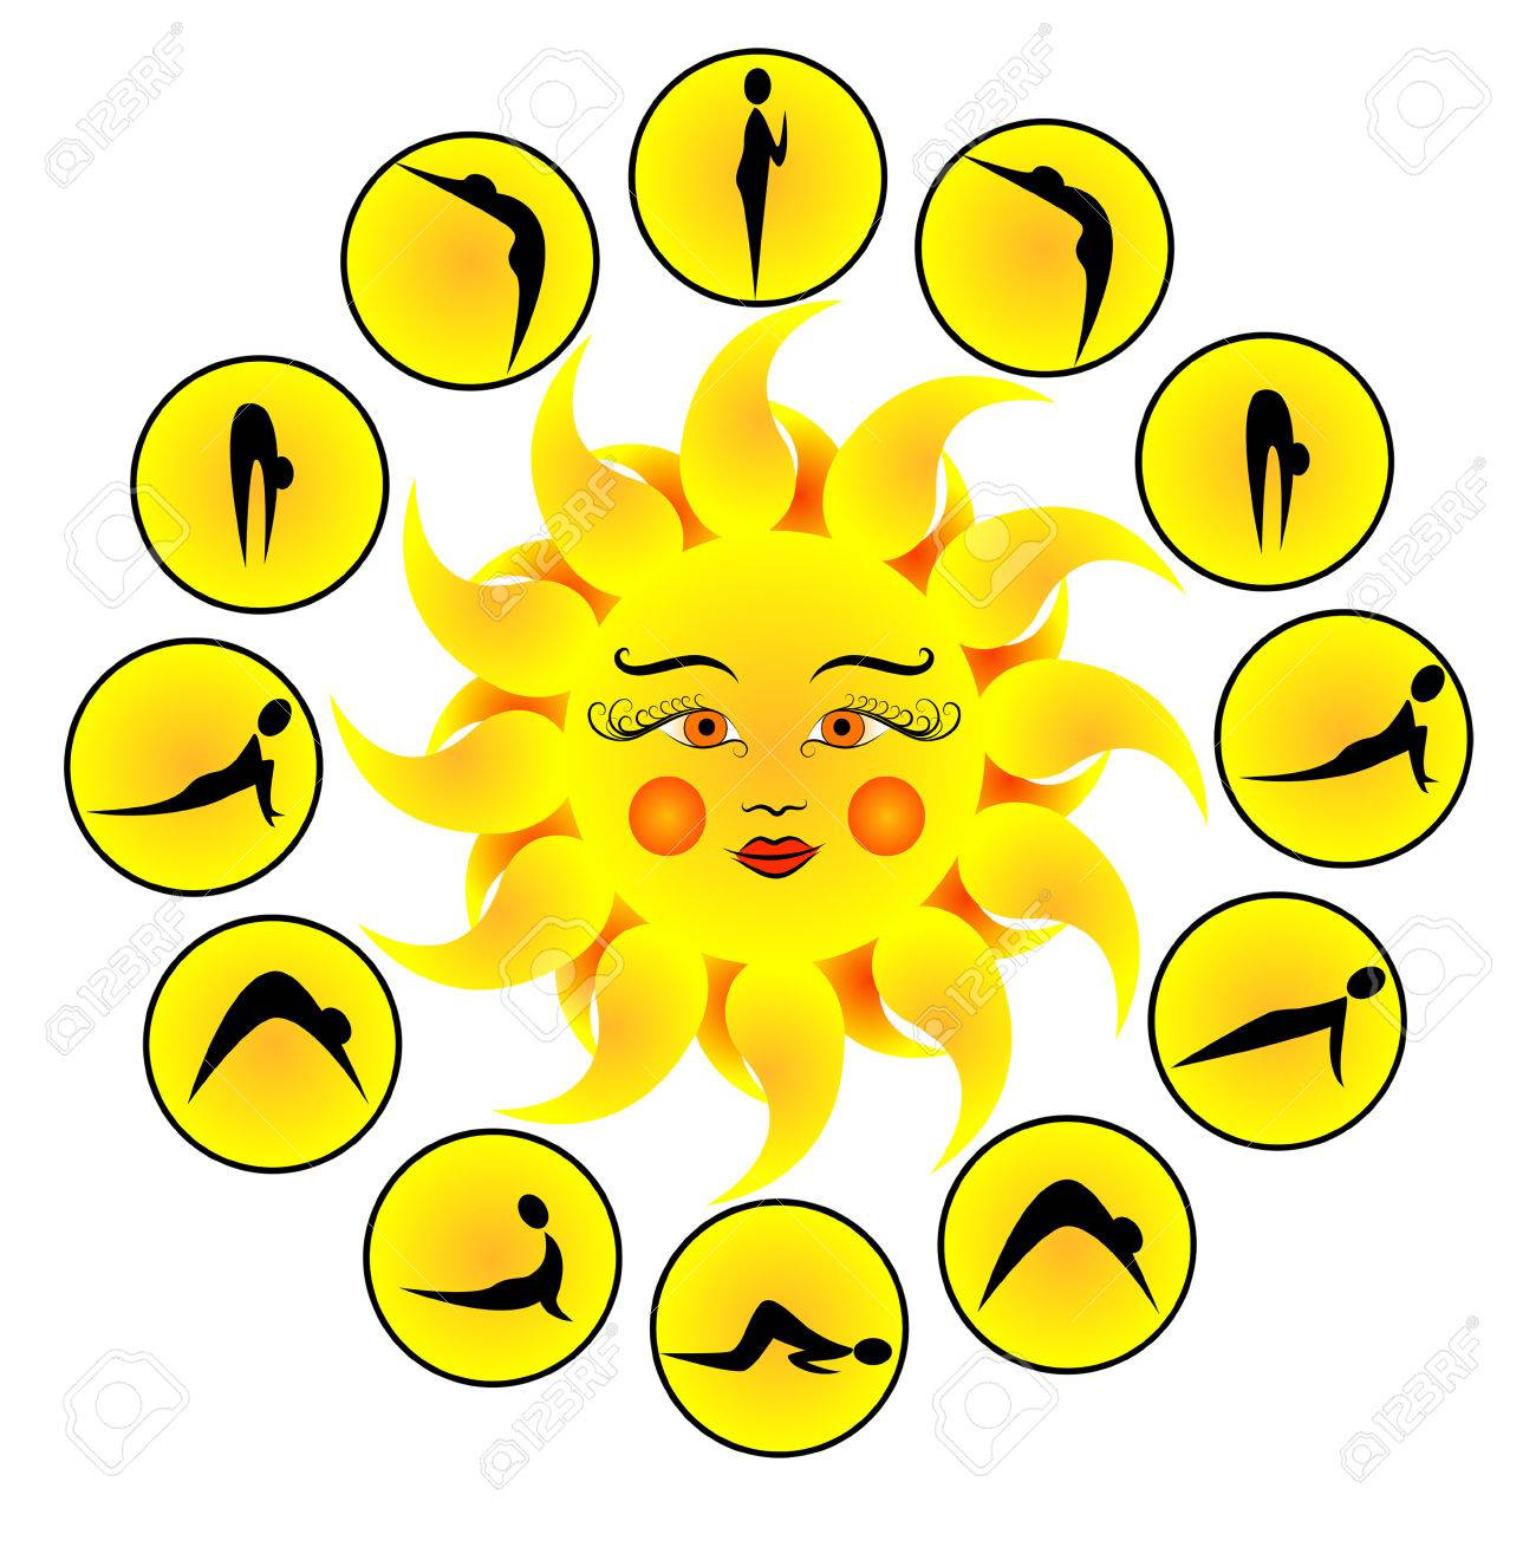 Surya Namaskar (Sun Salutation).